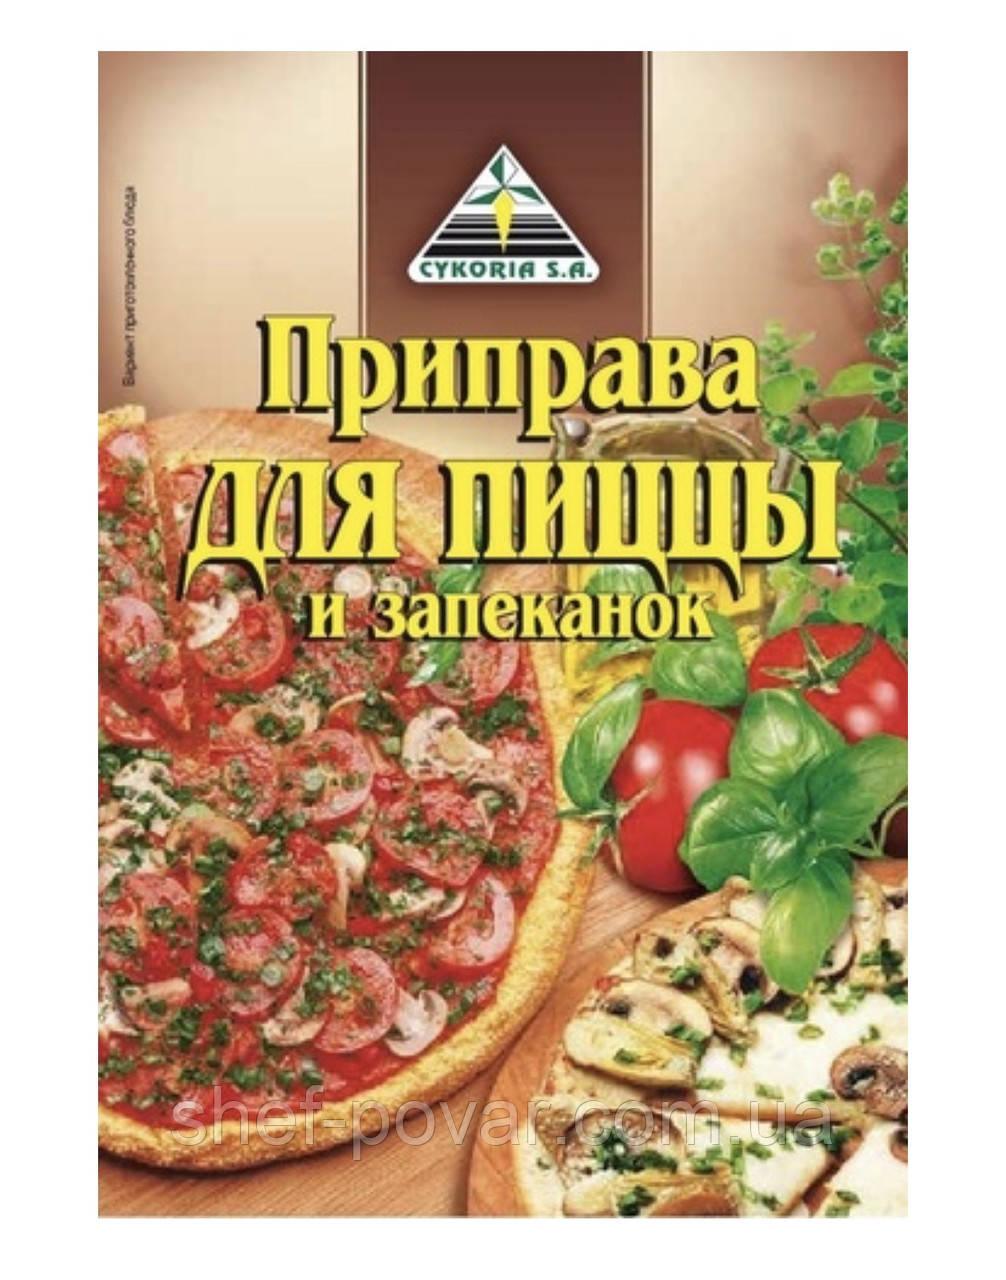 Приправа для пиццы 30гр ТМ «Cykoria s. a.»